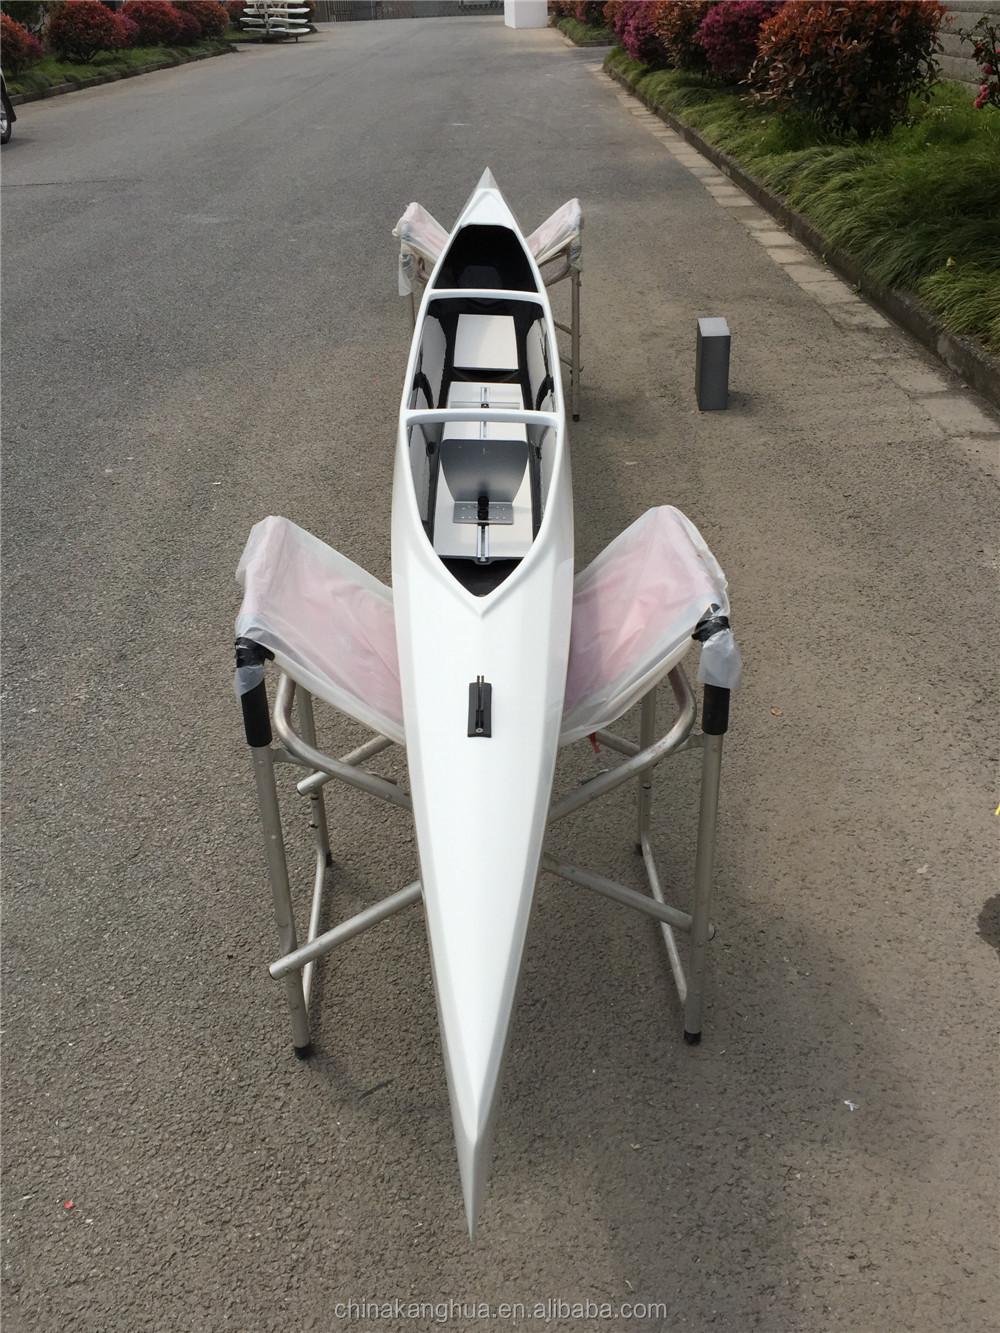 hot sale Lightweight racing carbon/fiberglass200m/500m/1000m C1 canoe /  80-85 kg grade A+ sigle canoe, View c1 canoe, kanghua Product Details from